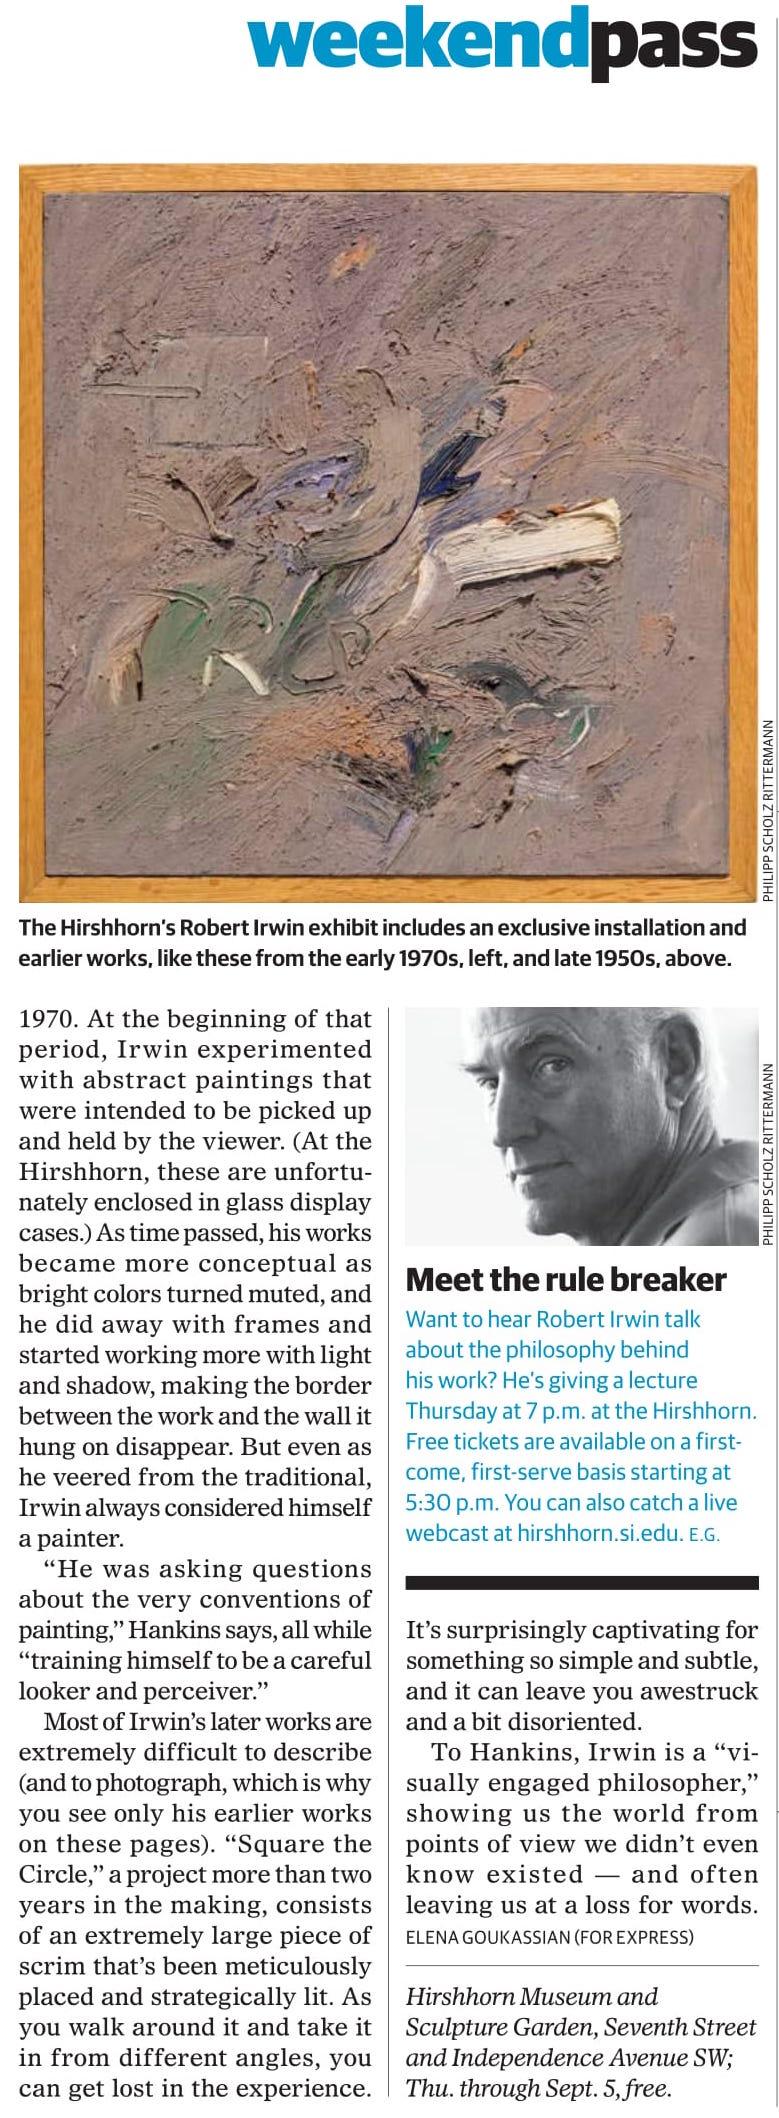 https://www.washingtonpost.com/express/wp/2016/04/07/robert-irwins-new-exhibit-at-the-hirshhorn-is-simply-unexplainable